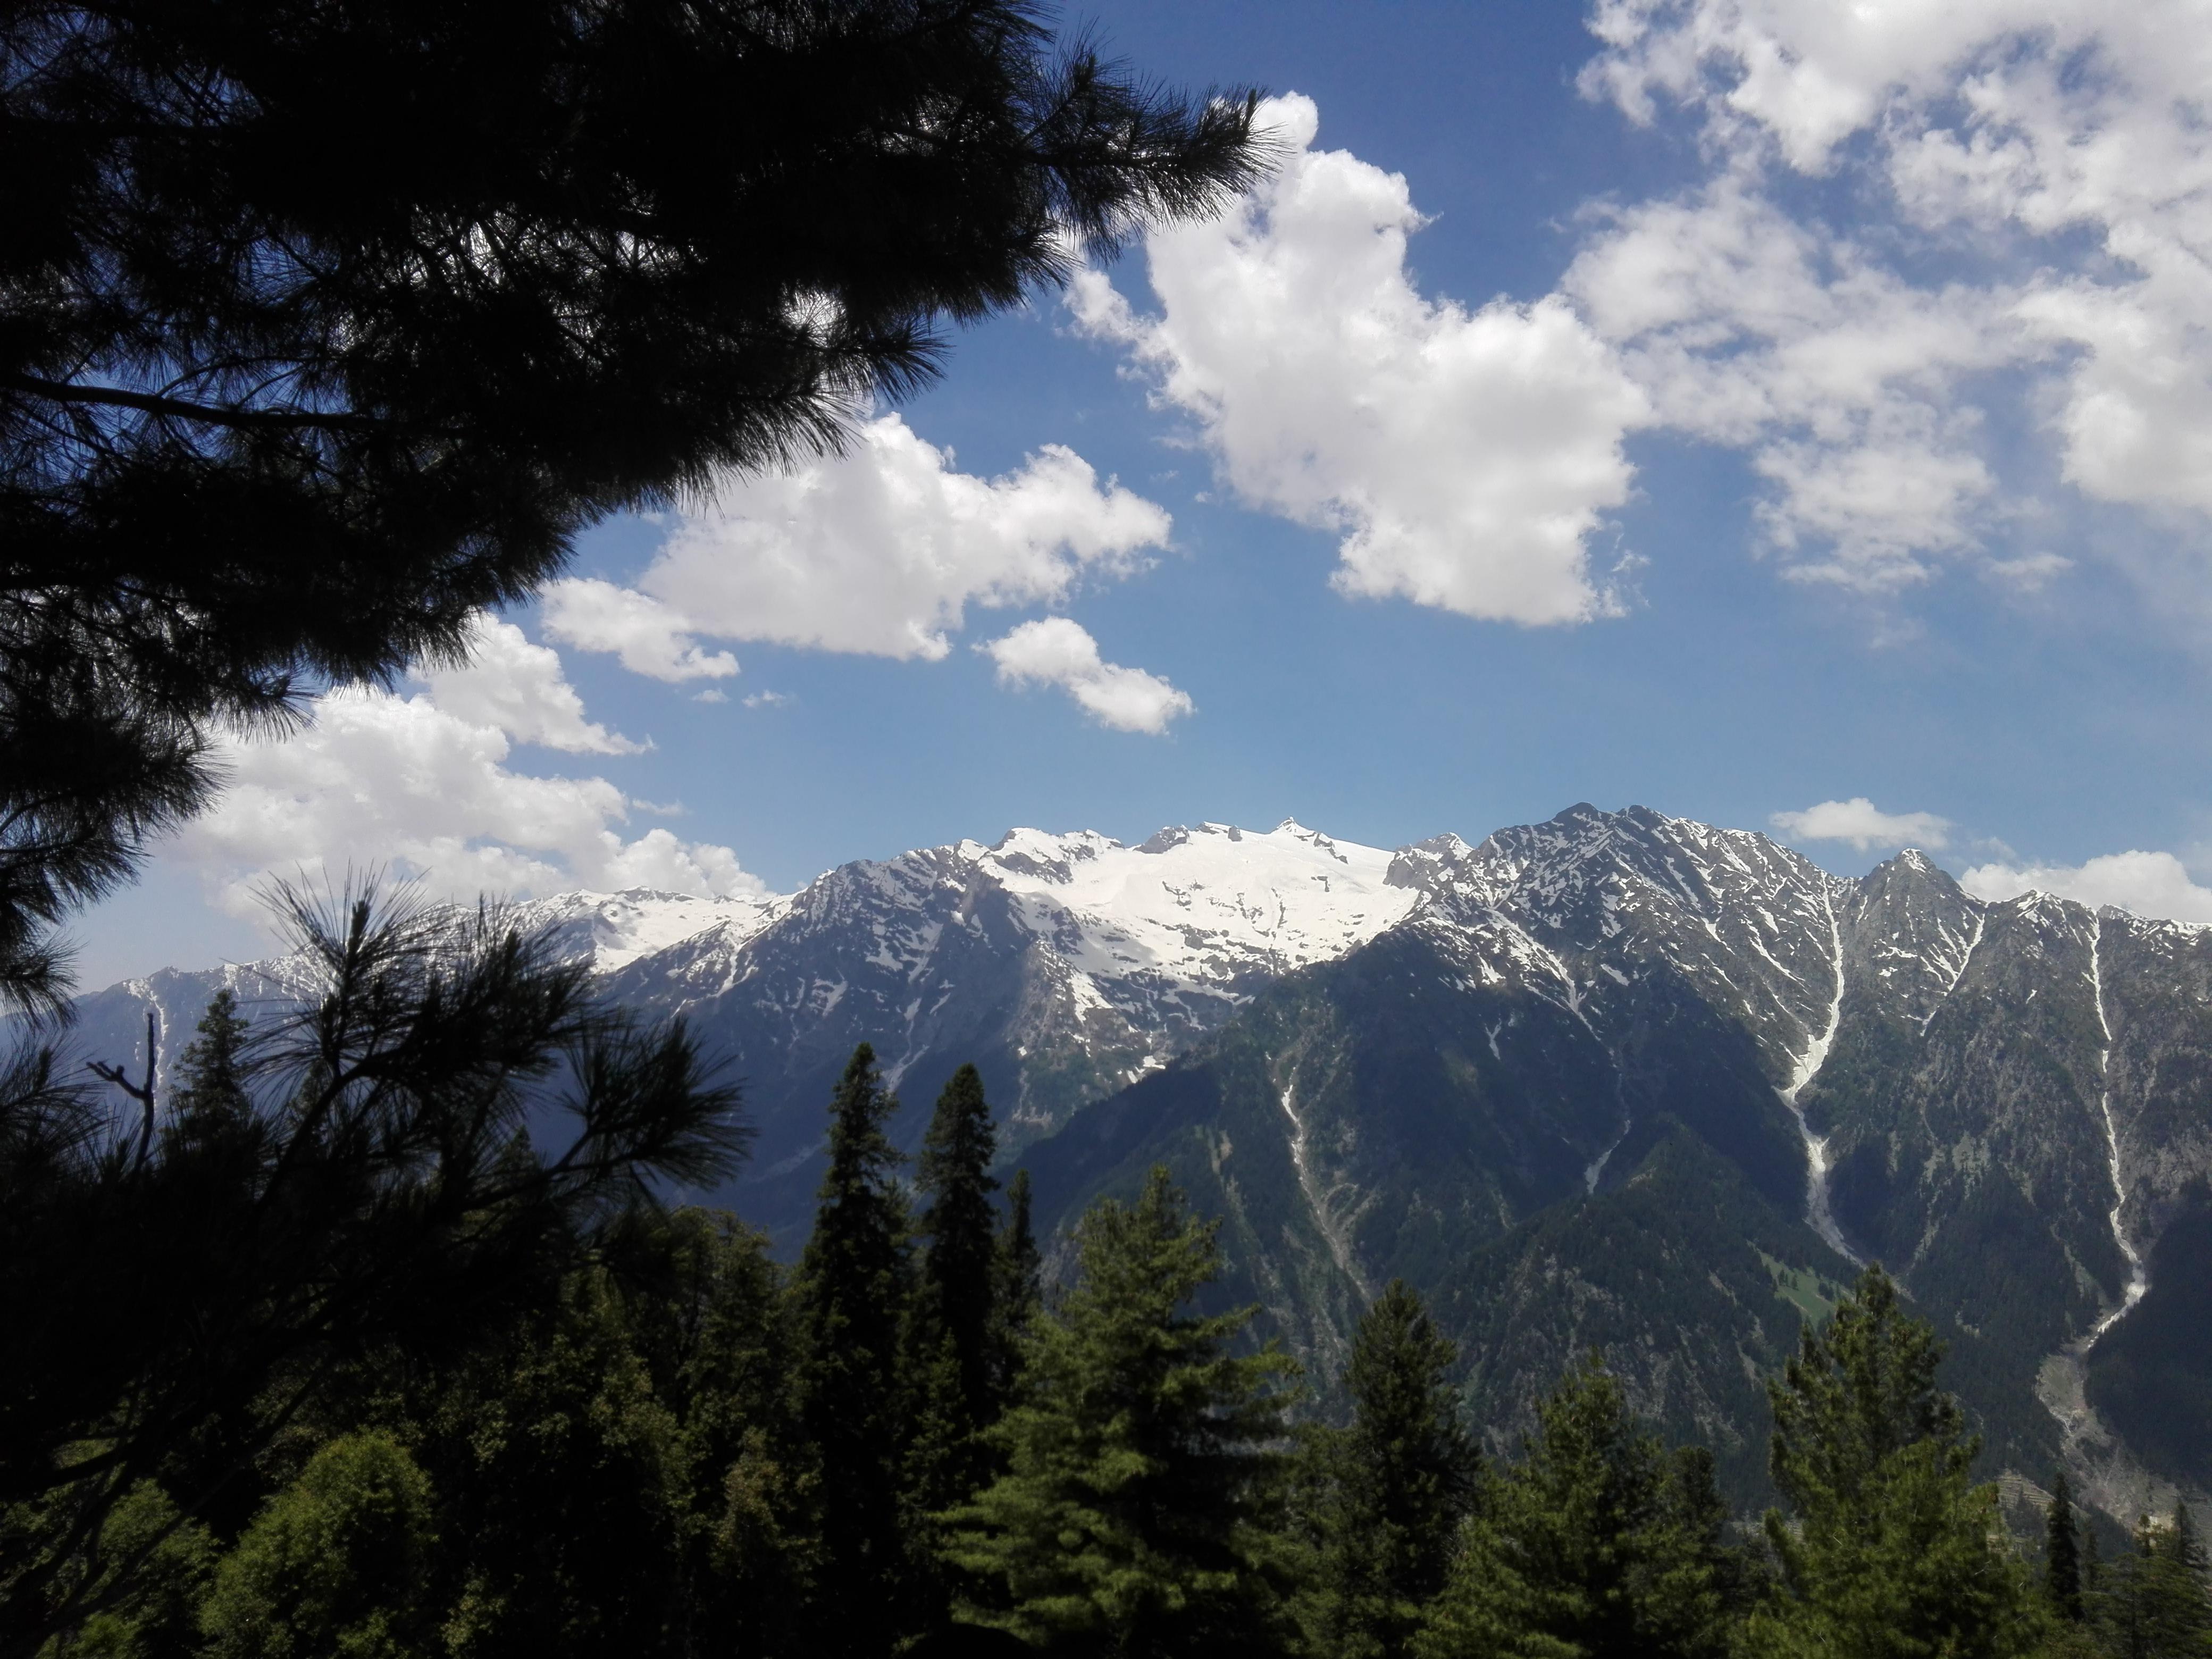 File:Ushu Glacier, Kalam, Swat, Pakistan.jpg